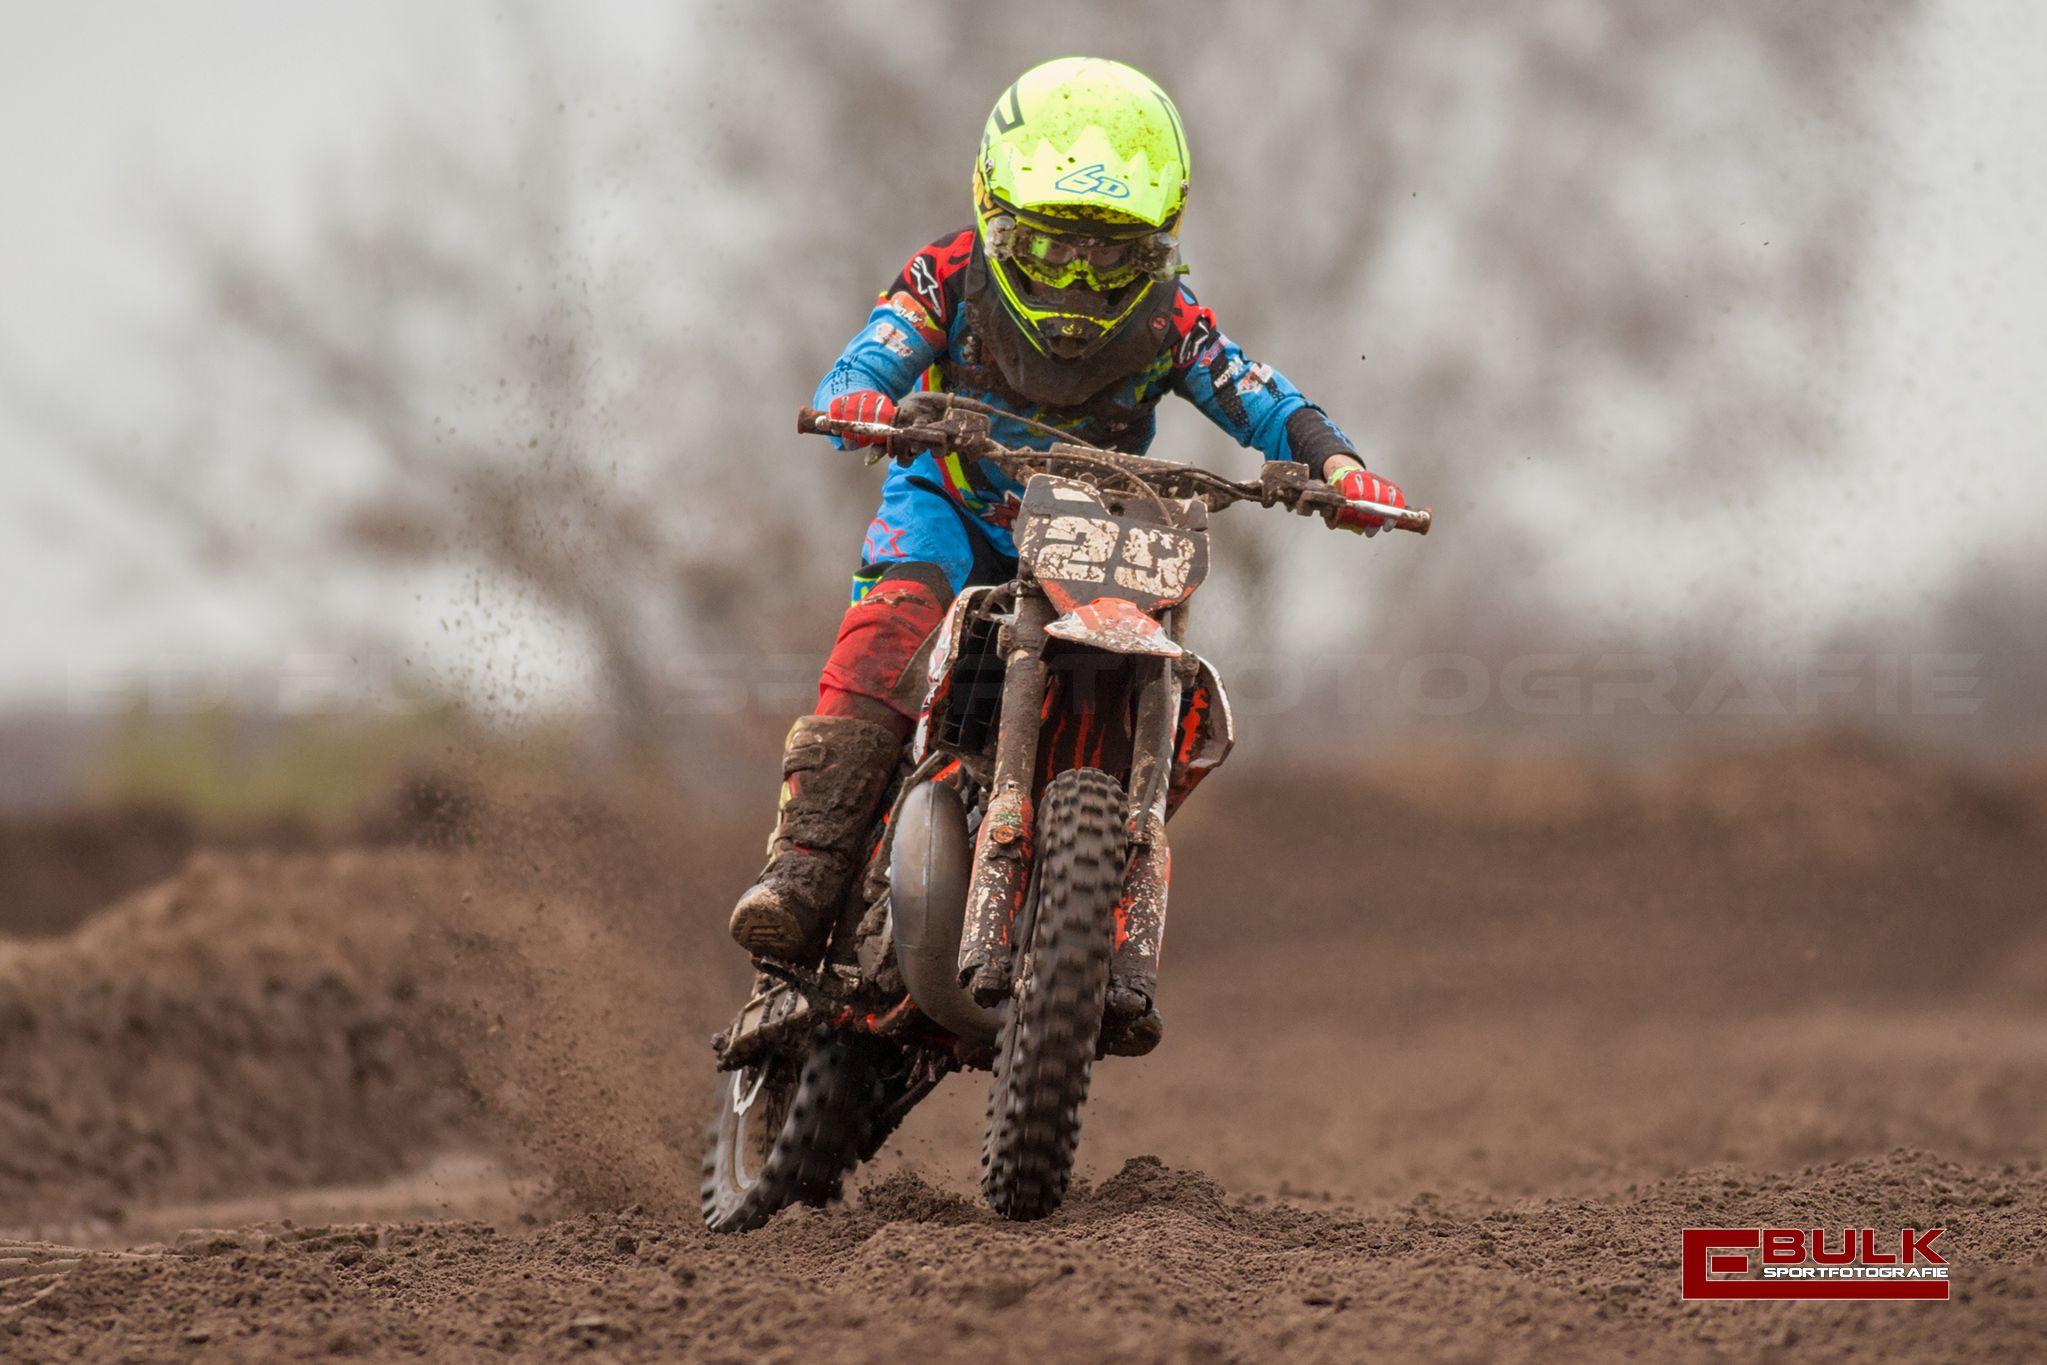 ebs_1194-ed_bulk_sportfotografie